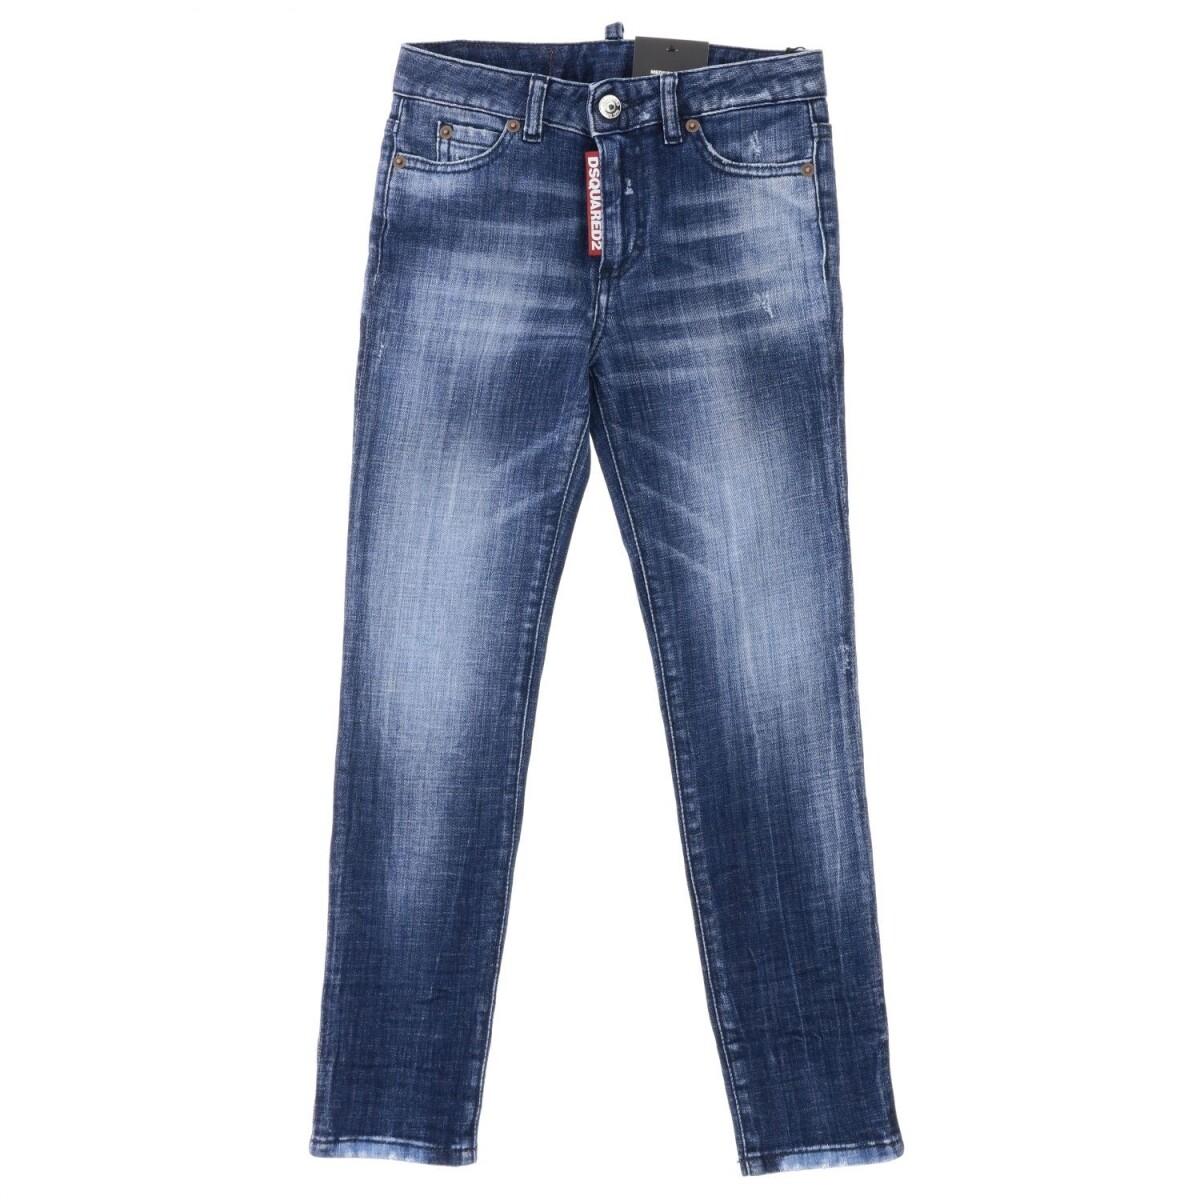 DSQUARED2 | TWIGGY JEANS | DQ01DX D00YA jeans